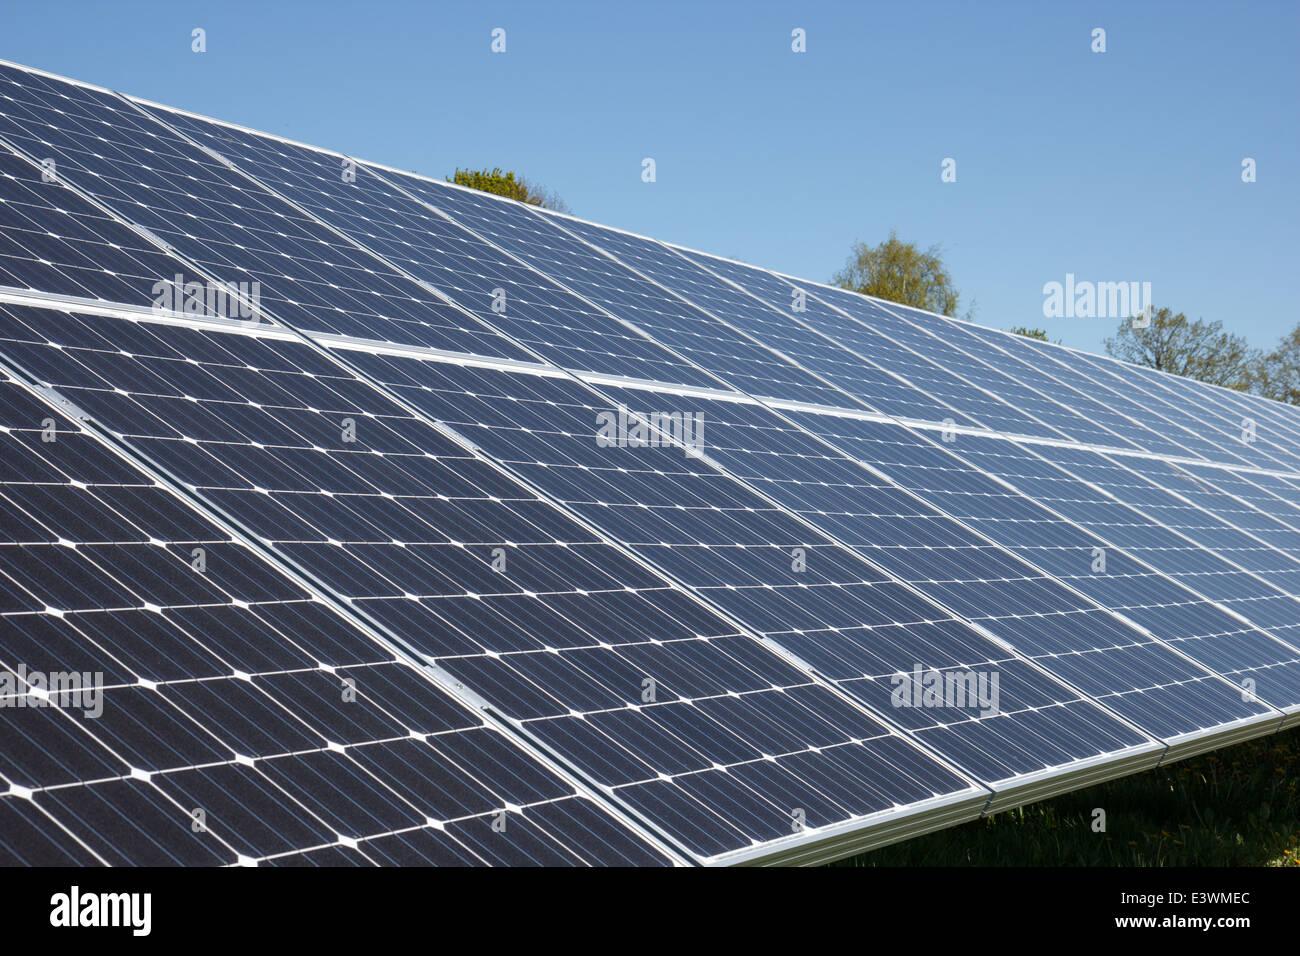 Electricity Environment Photos   Electricity Environment Images - Alamy 872f50d2b4d7